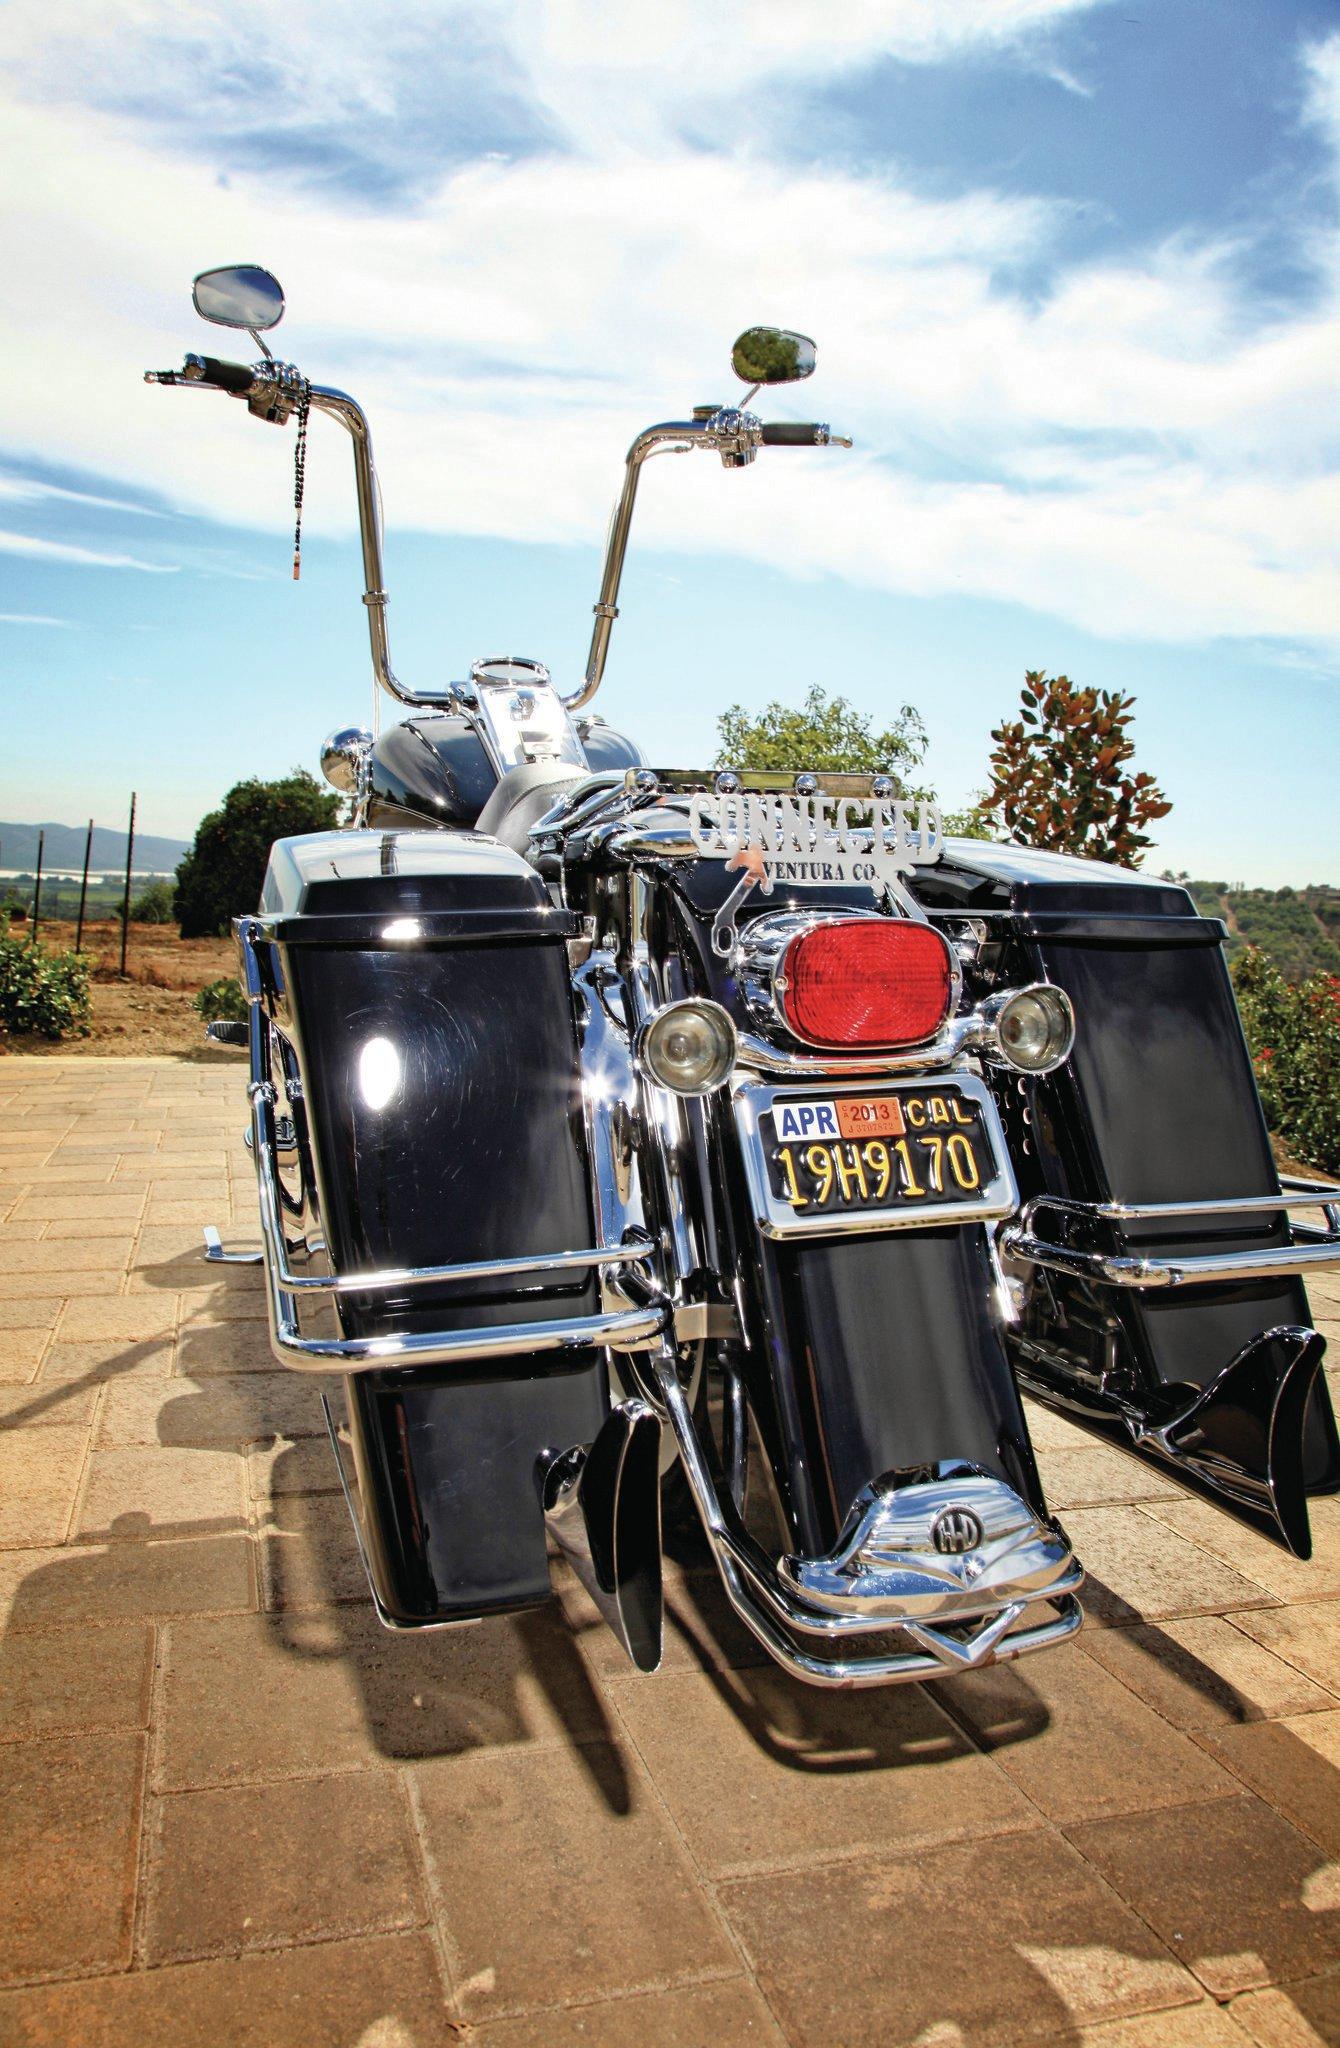 Harley Davidson Saddlebags: 2008 Harley Davidson Road King Classic